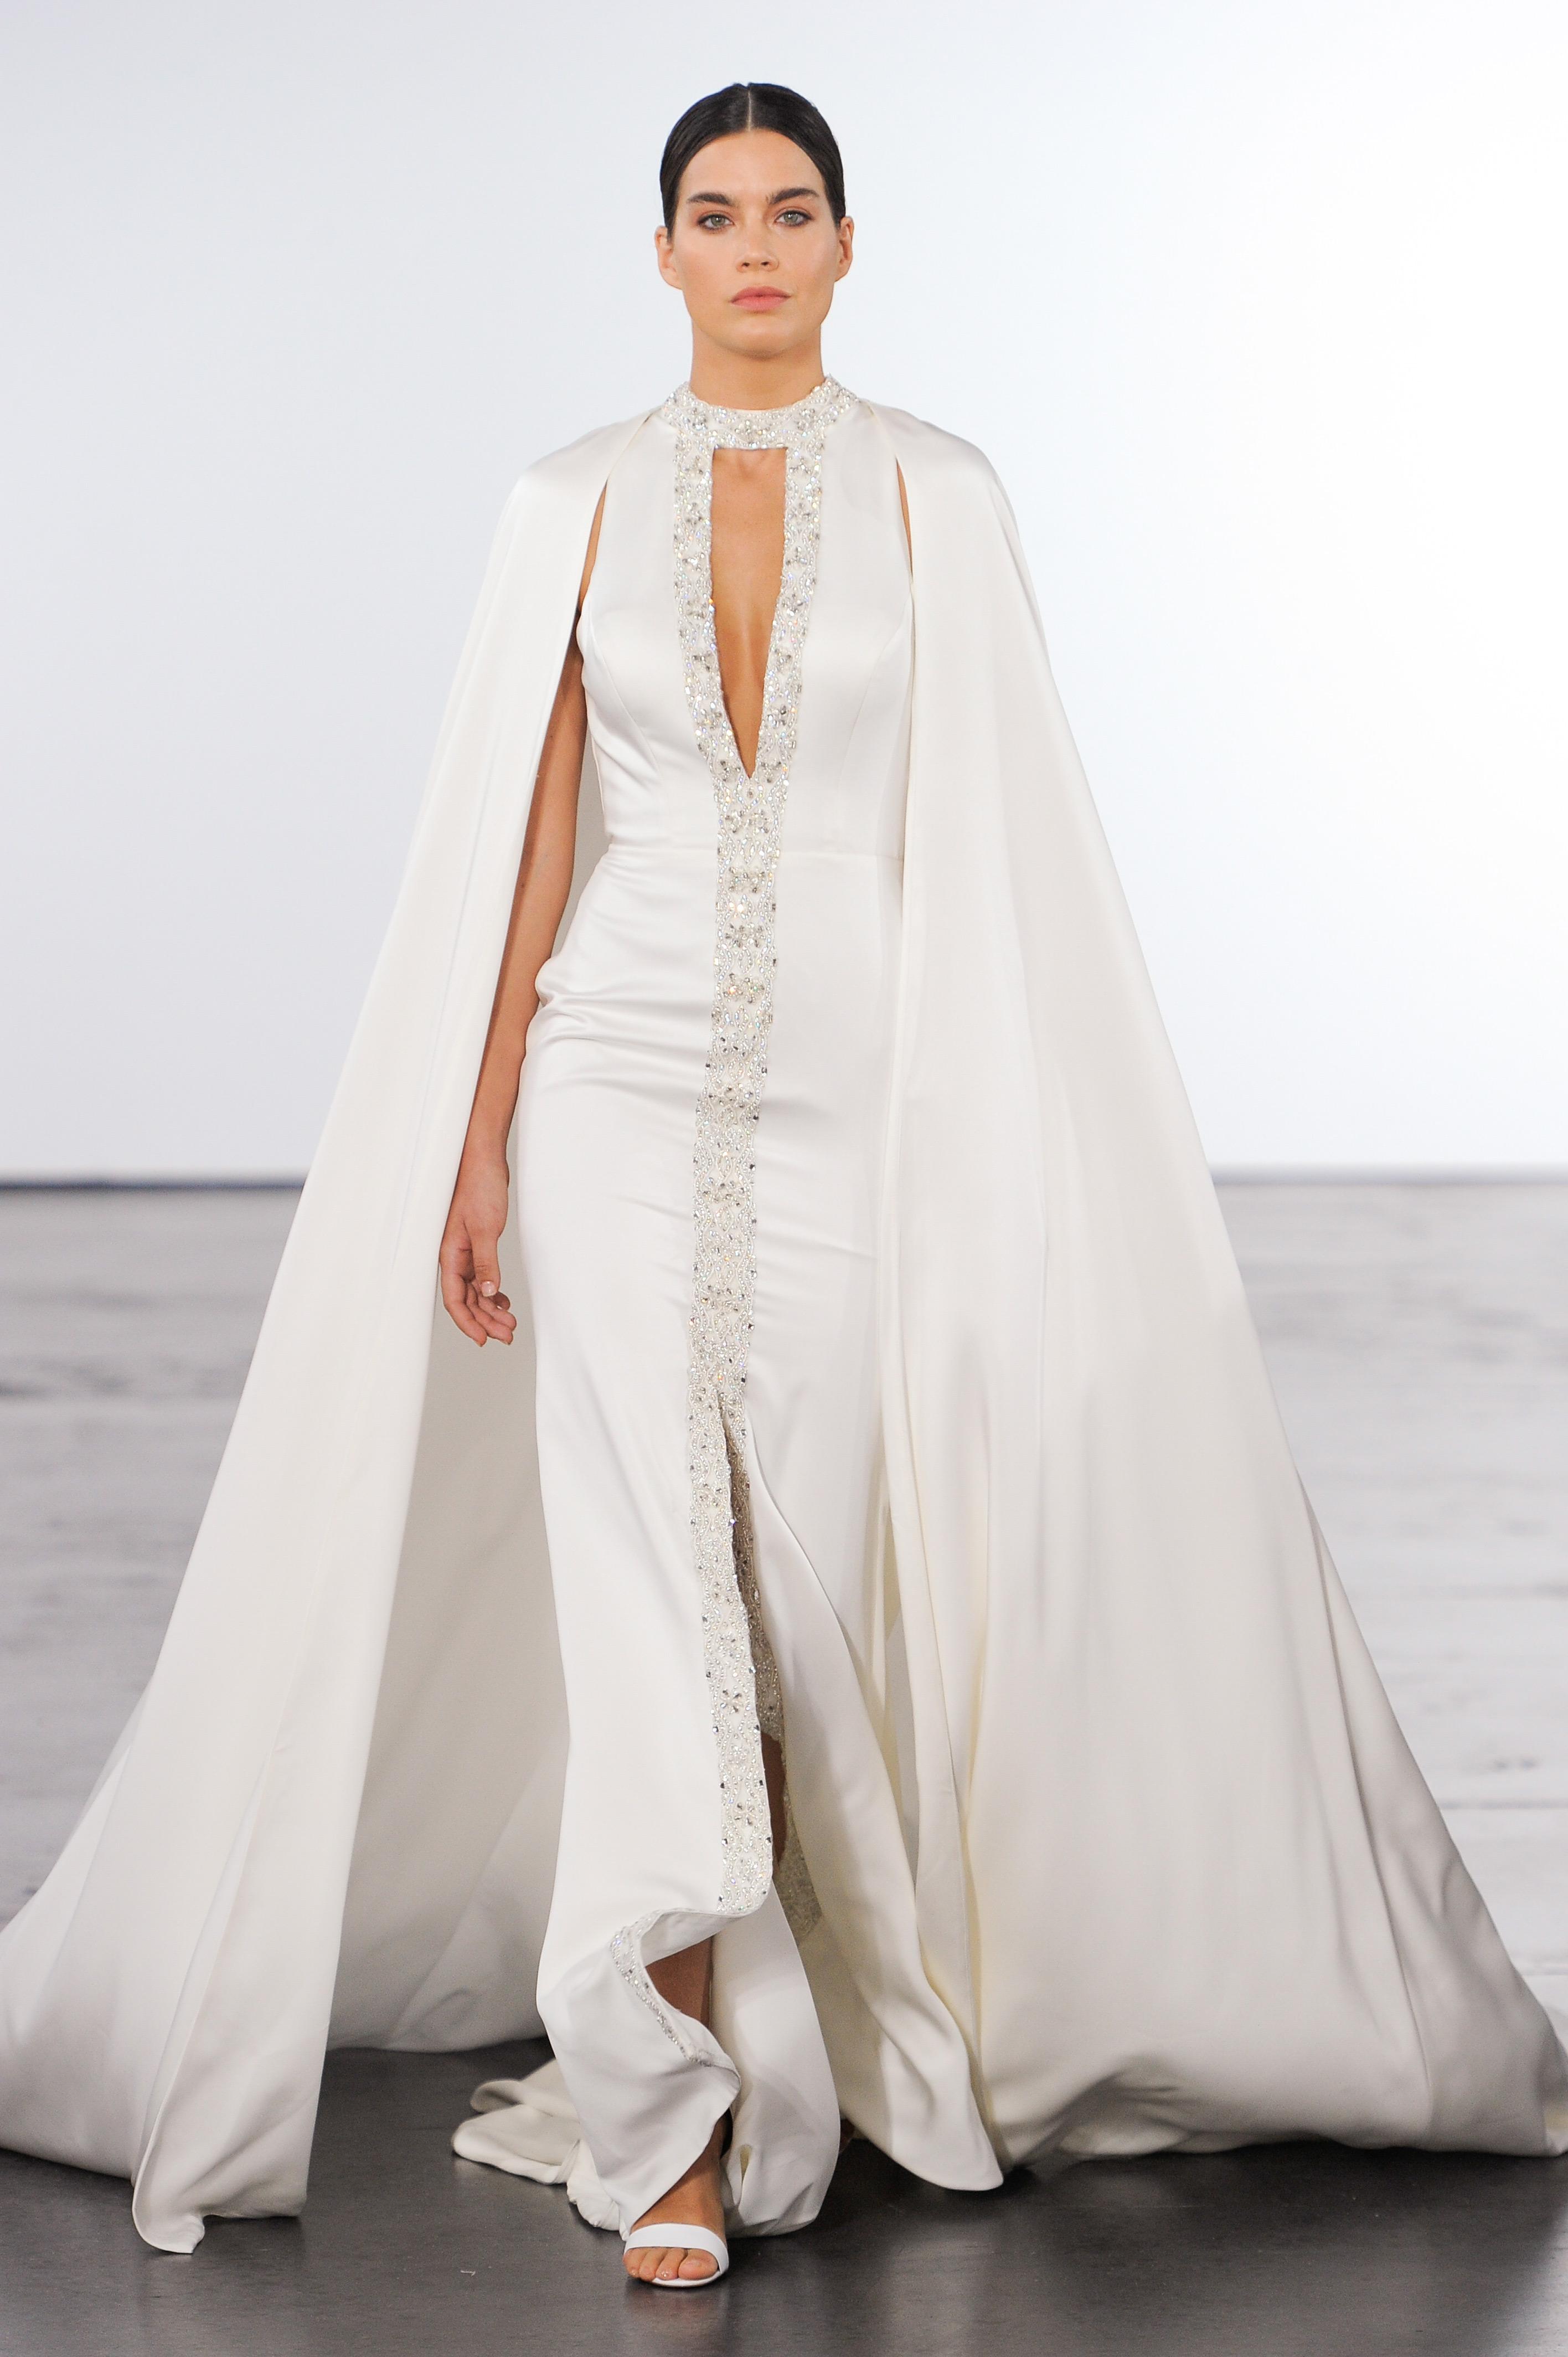 dennis basso wedding dress long sheath high neck